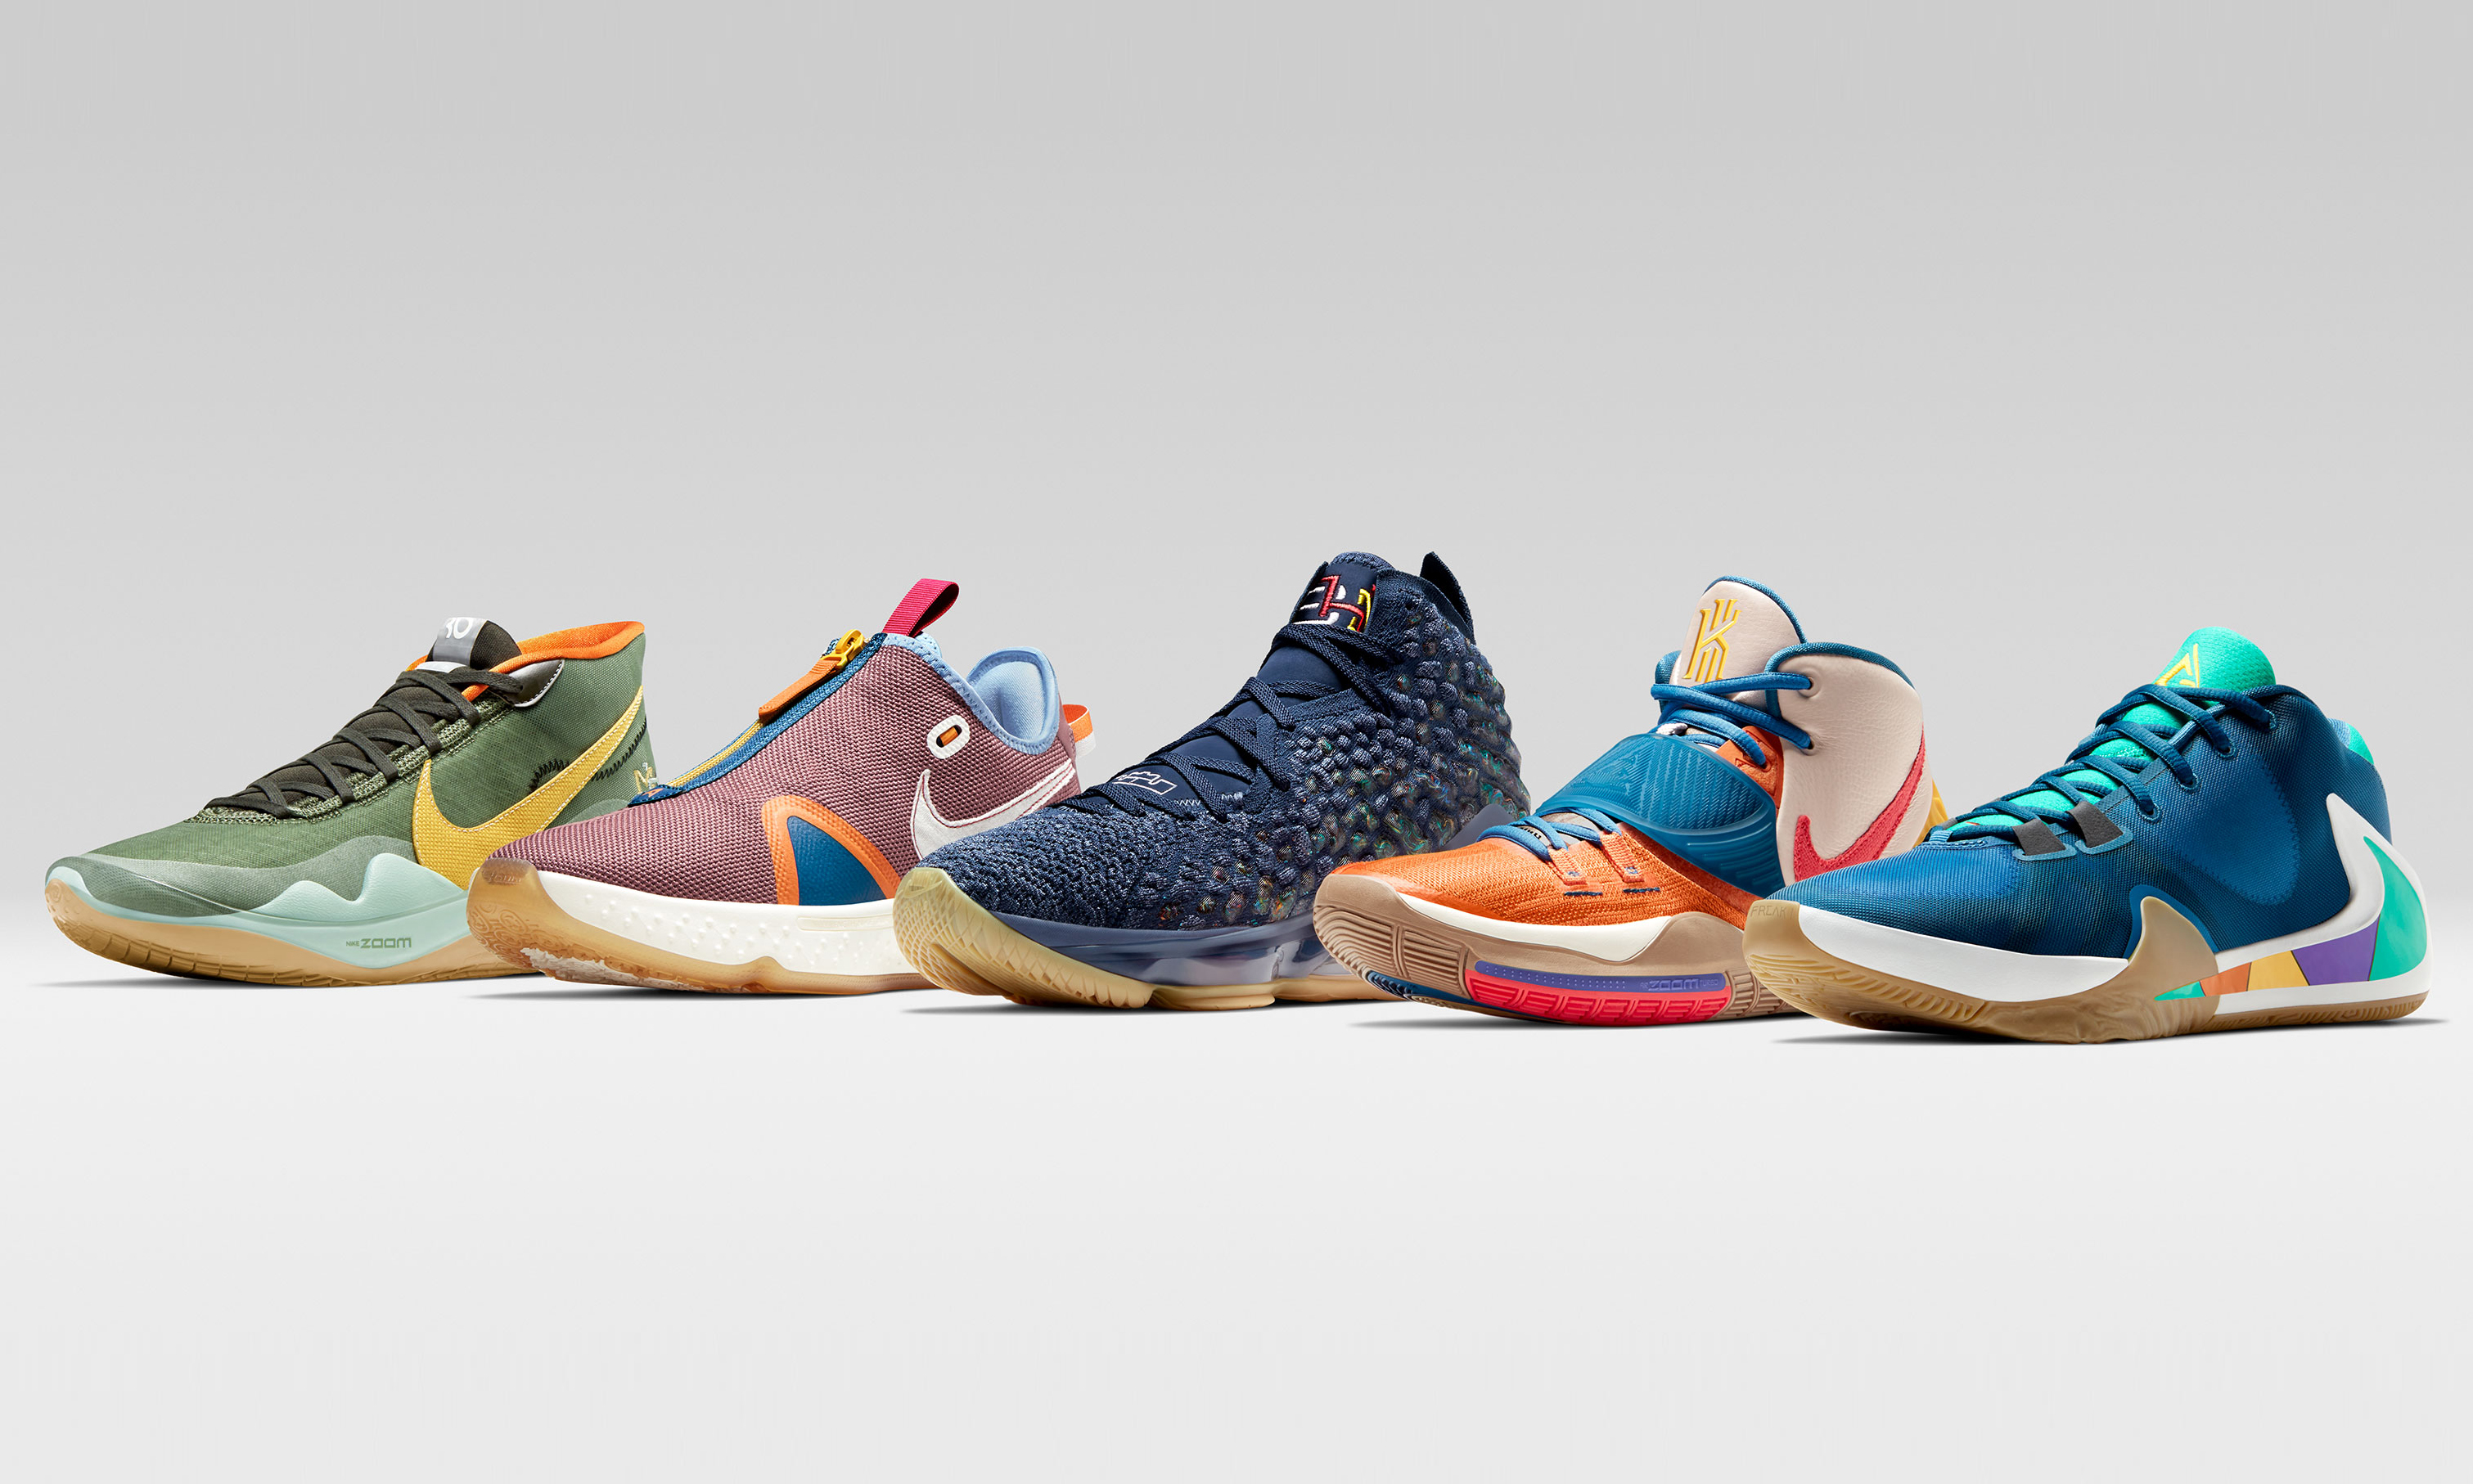 Nike Basketball「BHM」PE 系列预览